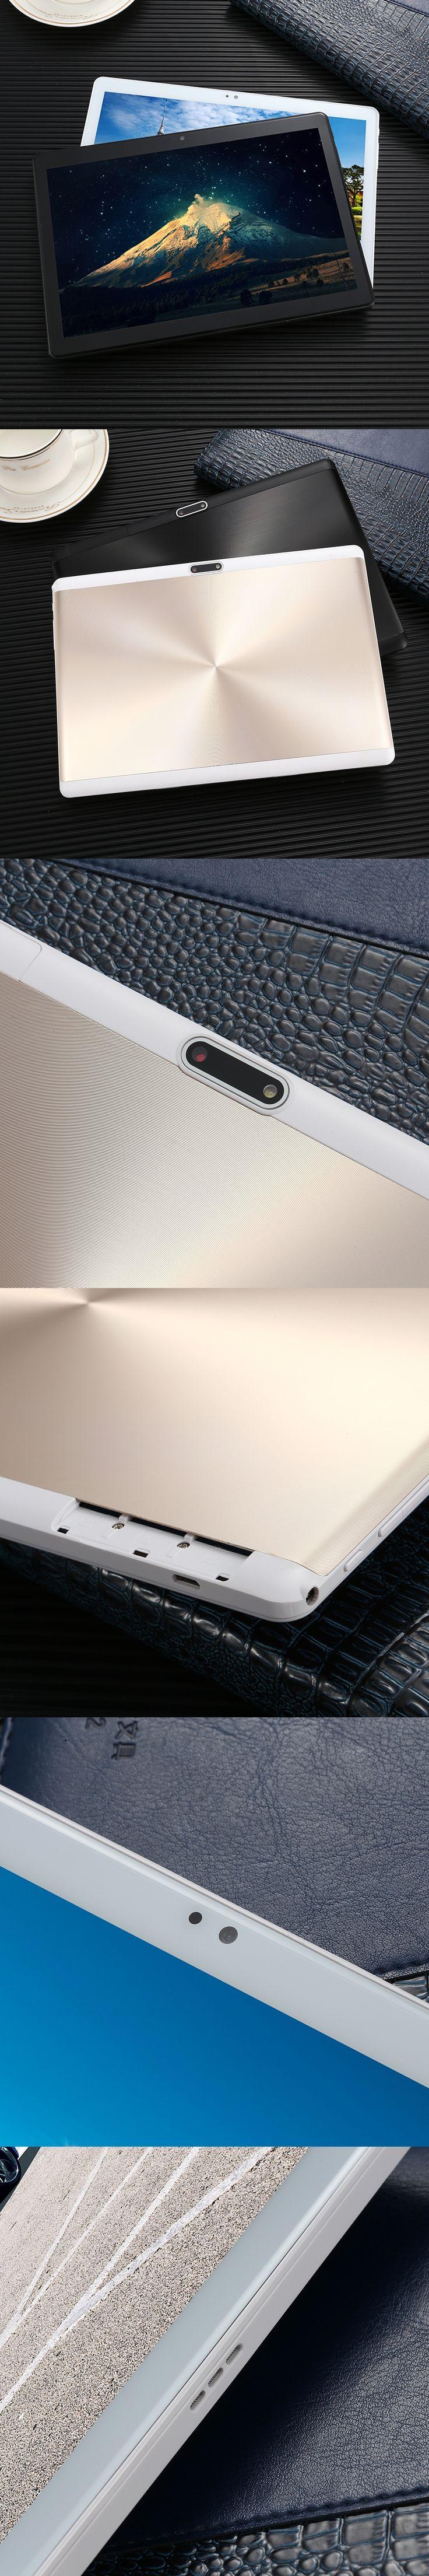 2018 10 core 10 inch Android 7.0  Tablet 4G LTE Dual SIM Phone Call 64GB ROM 4GB RAM WIFI bluetooth GPS 1920x1200 HD Tablet 10